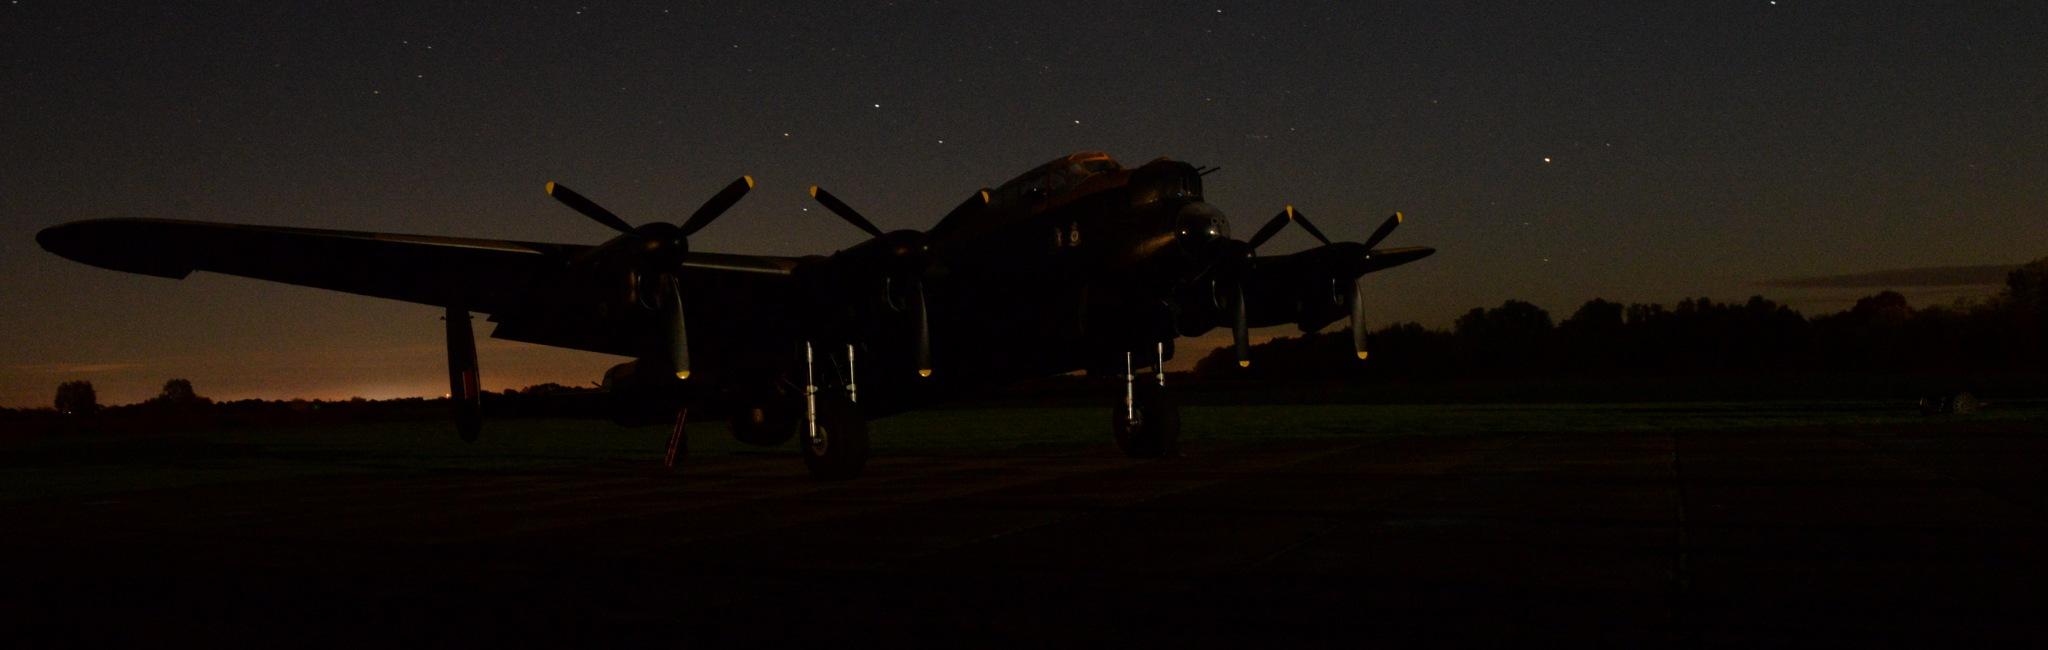 Lancaster Bomber against the sunset and stars by trevvie_uk